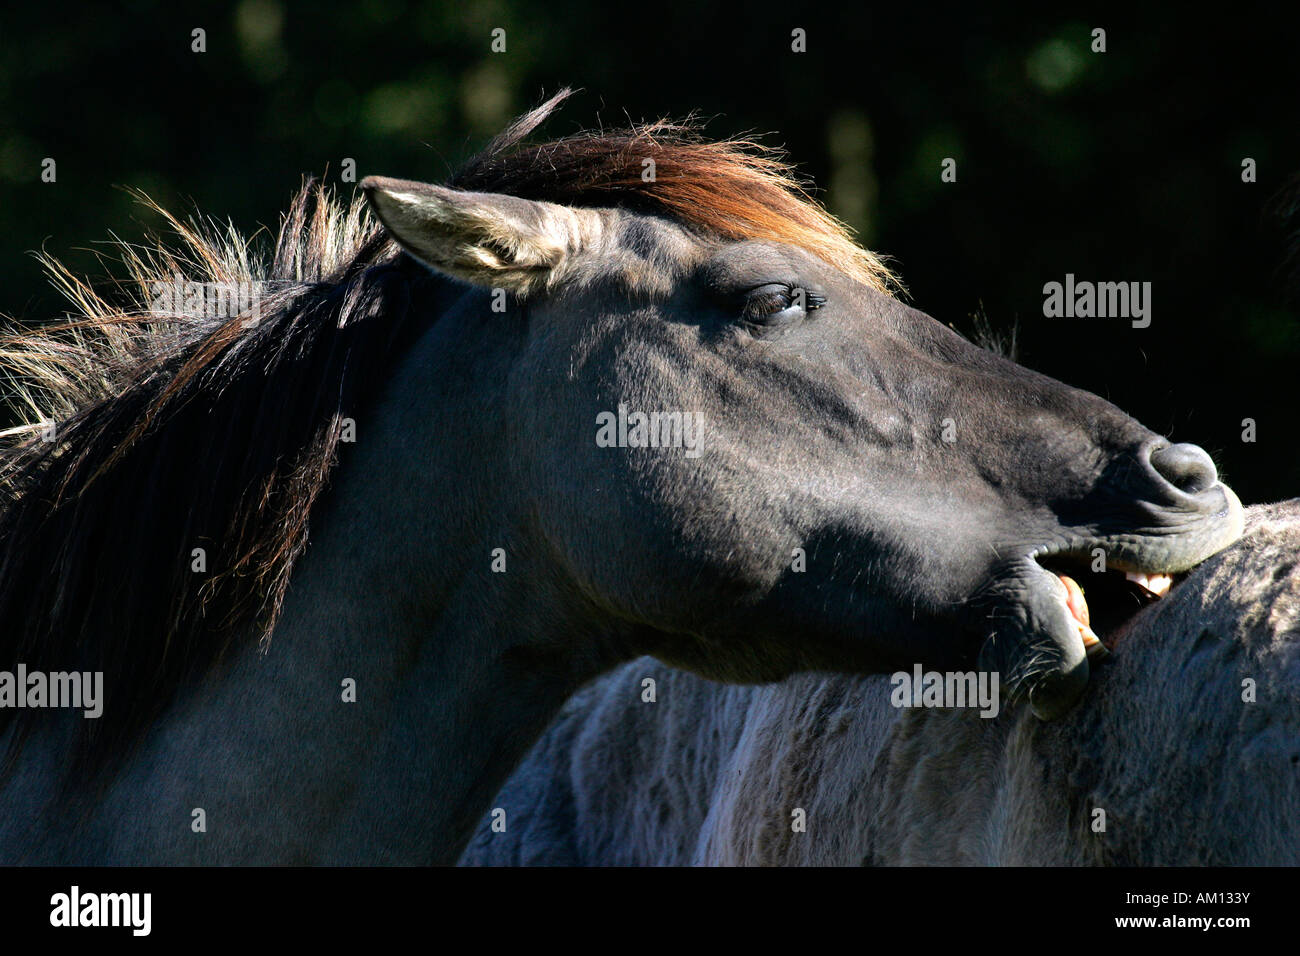 Konik horses - social behaviour (Equus przewalskii f. caballus) Stock Photo